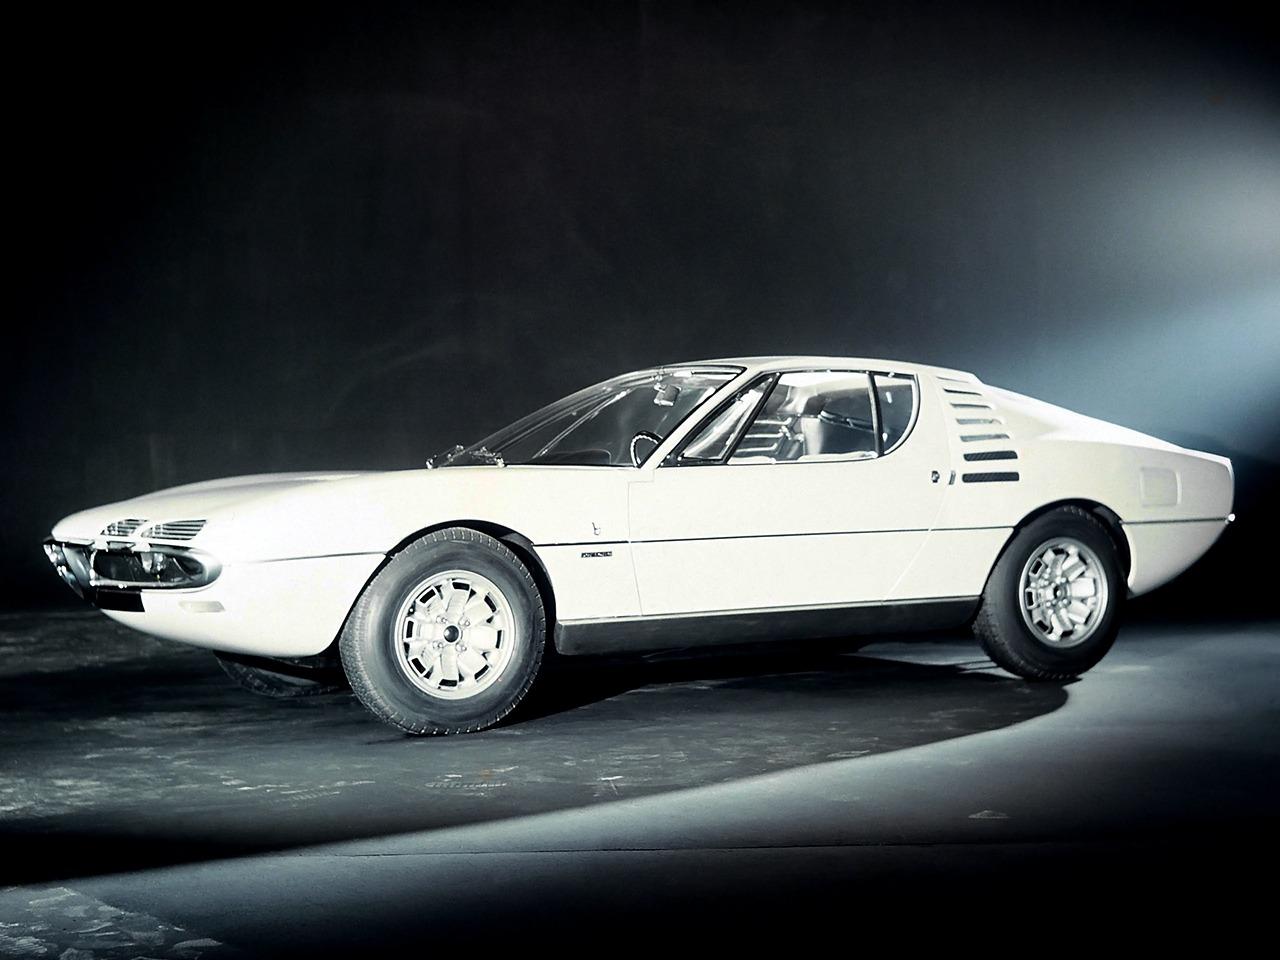 Alfa Romeo Montreal Expo (1967) – Old Concept Cars